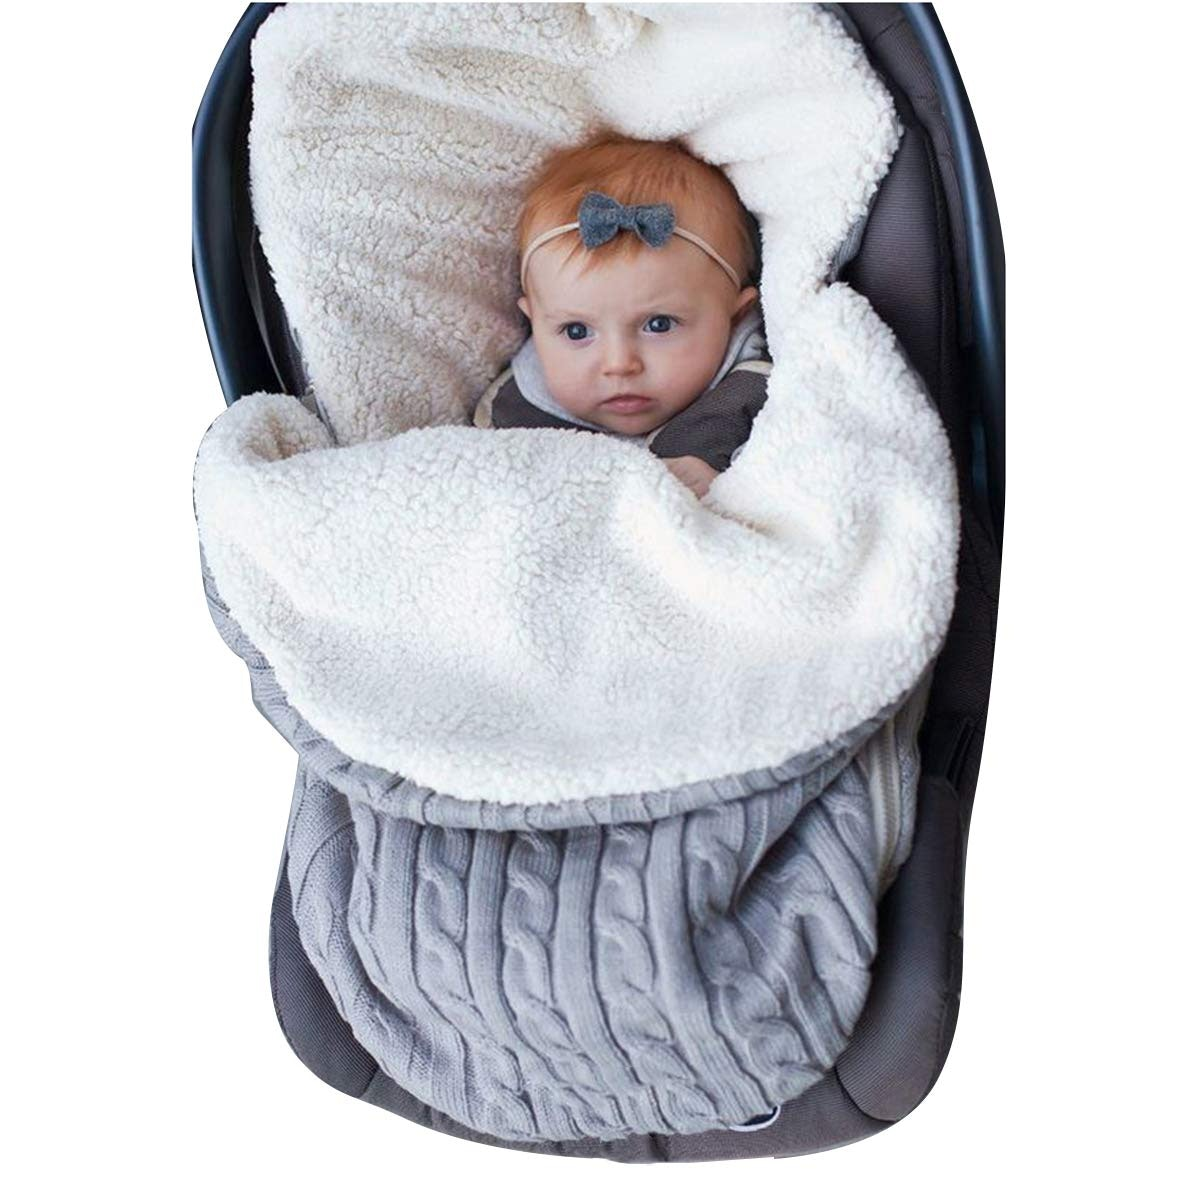 Car seat blanket// Cosy car seat blanket//pushchair footmuff// baby blanket